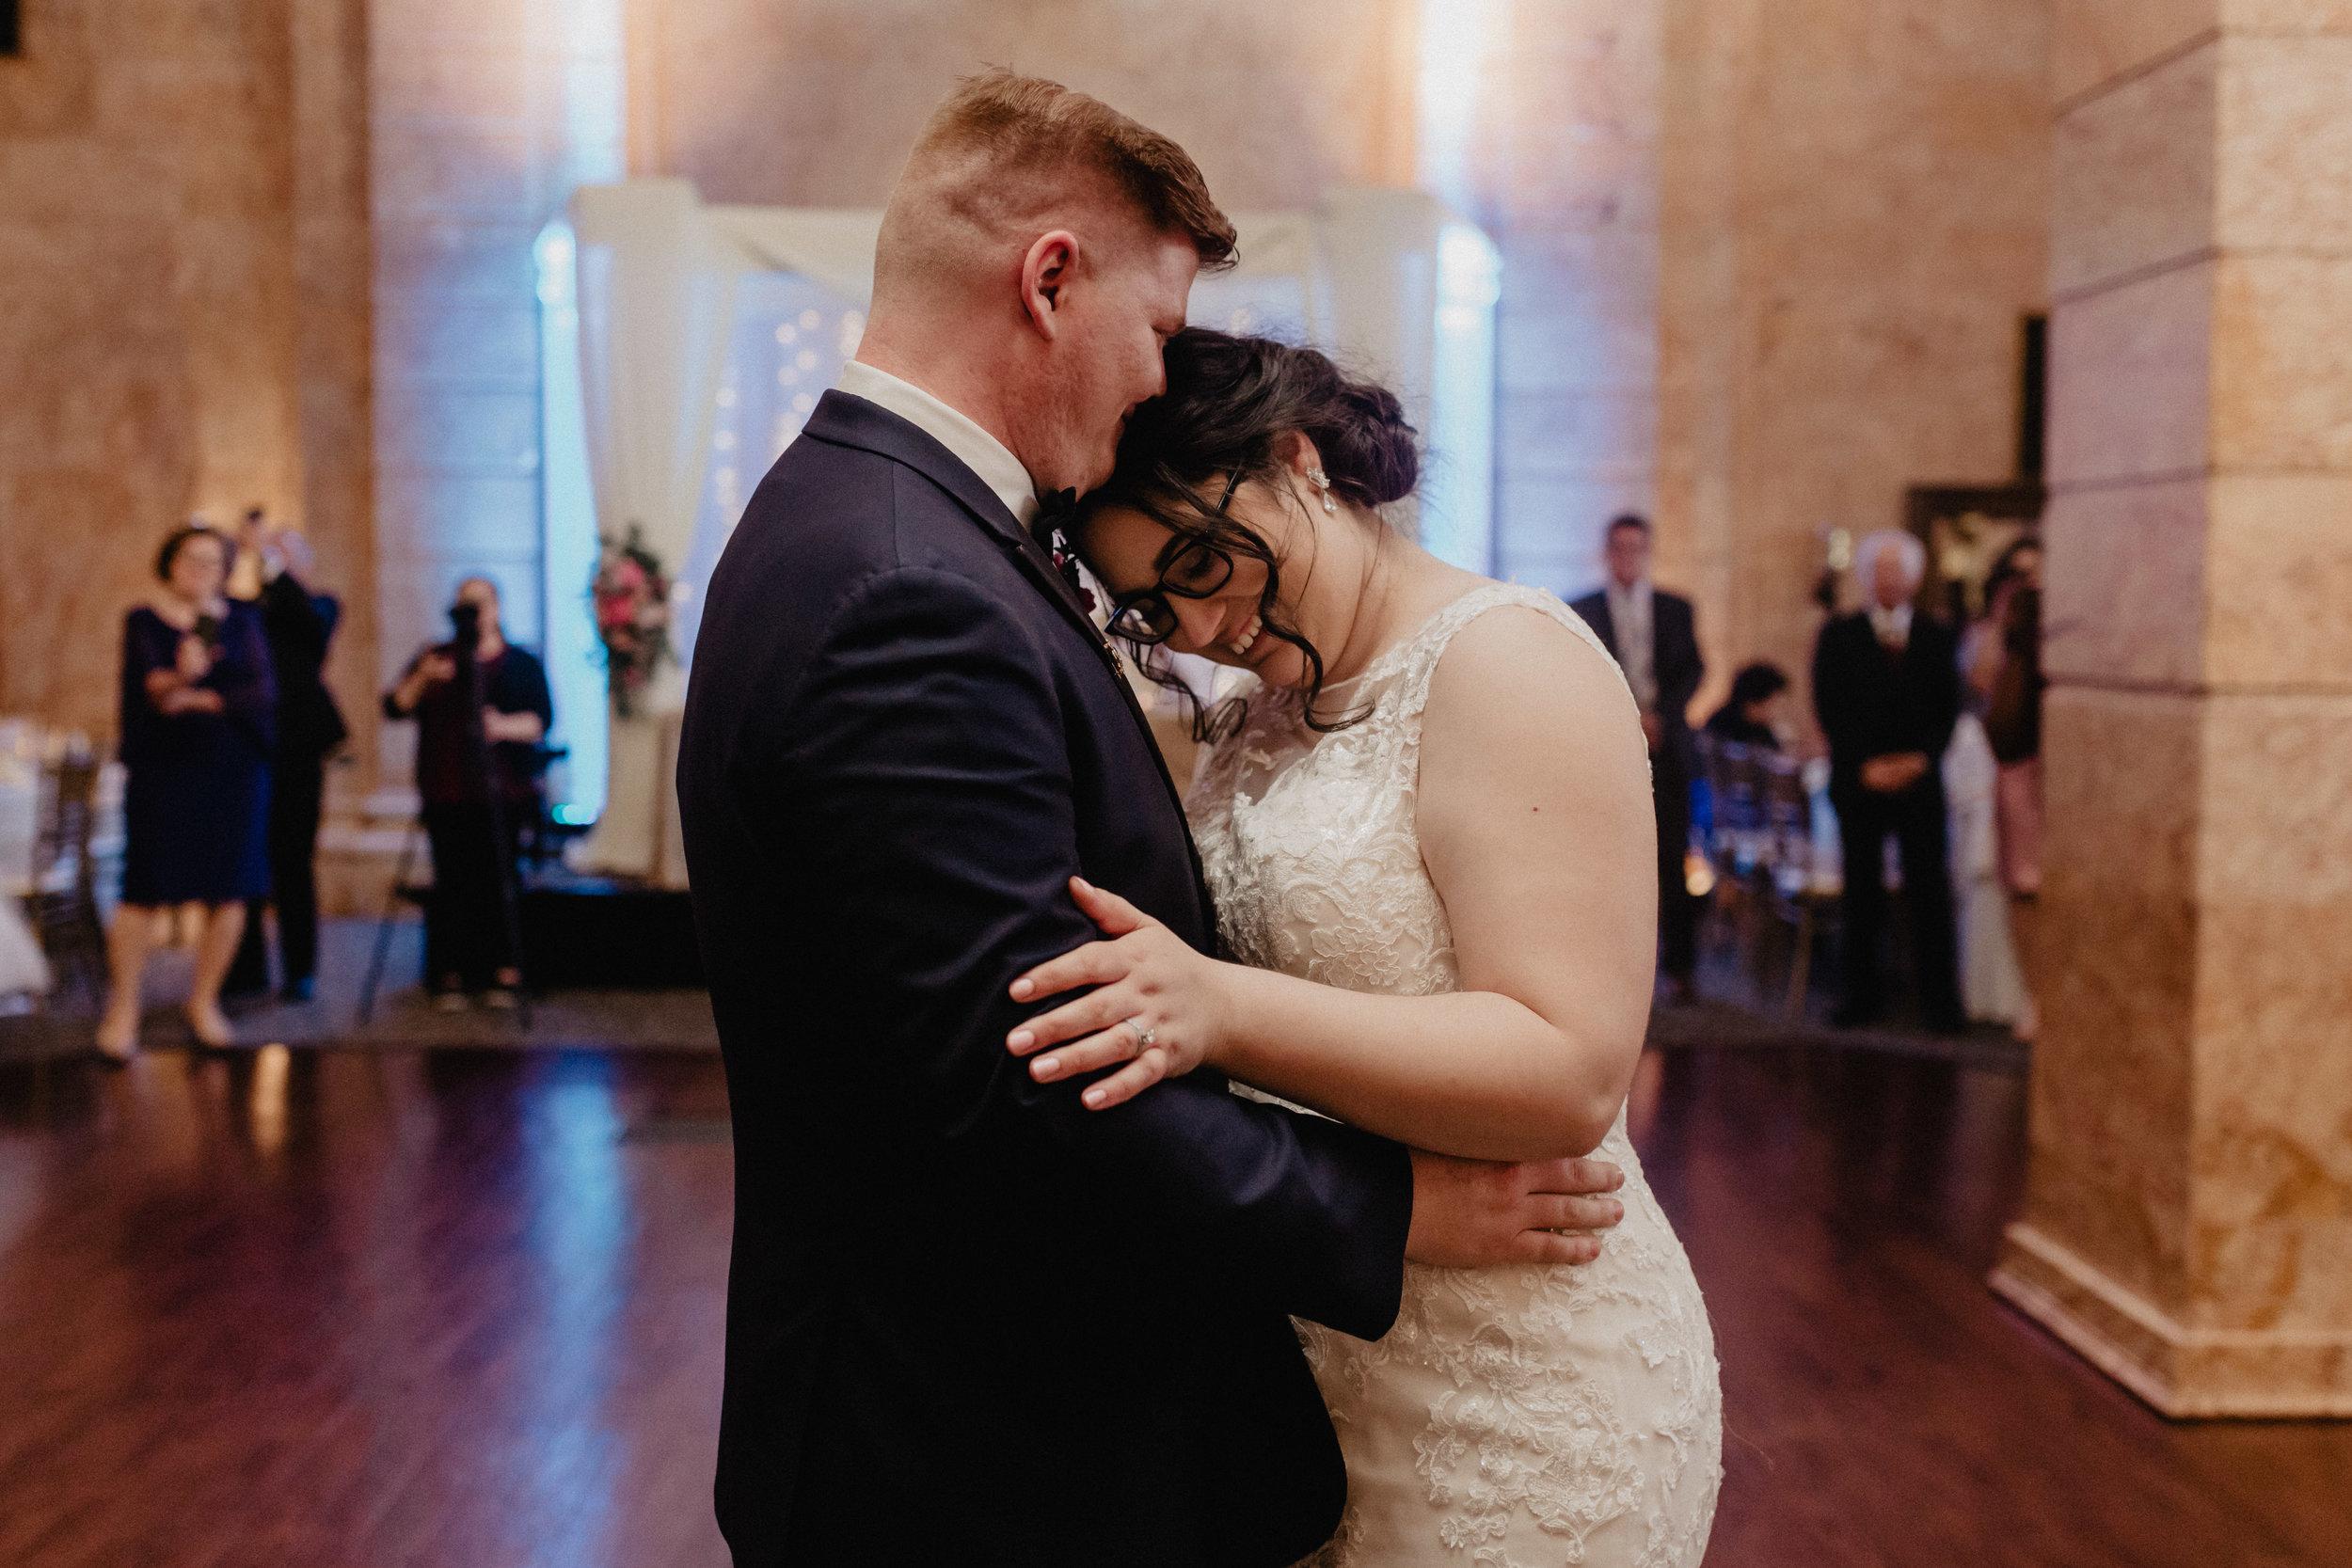 albany-new-york-wedding-48.jpg